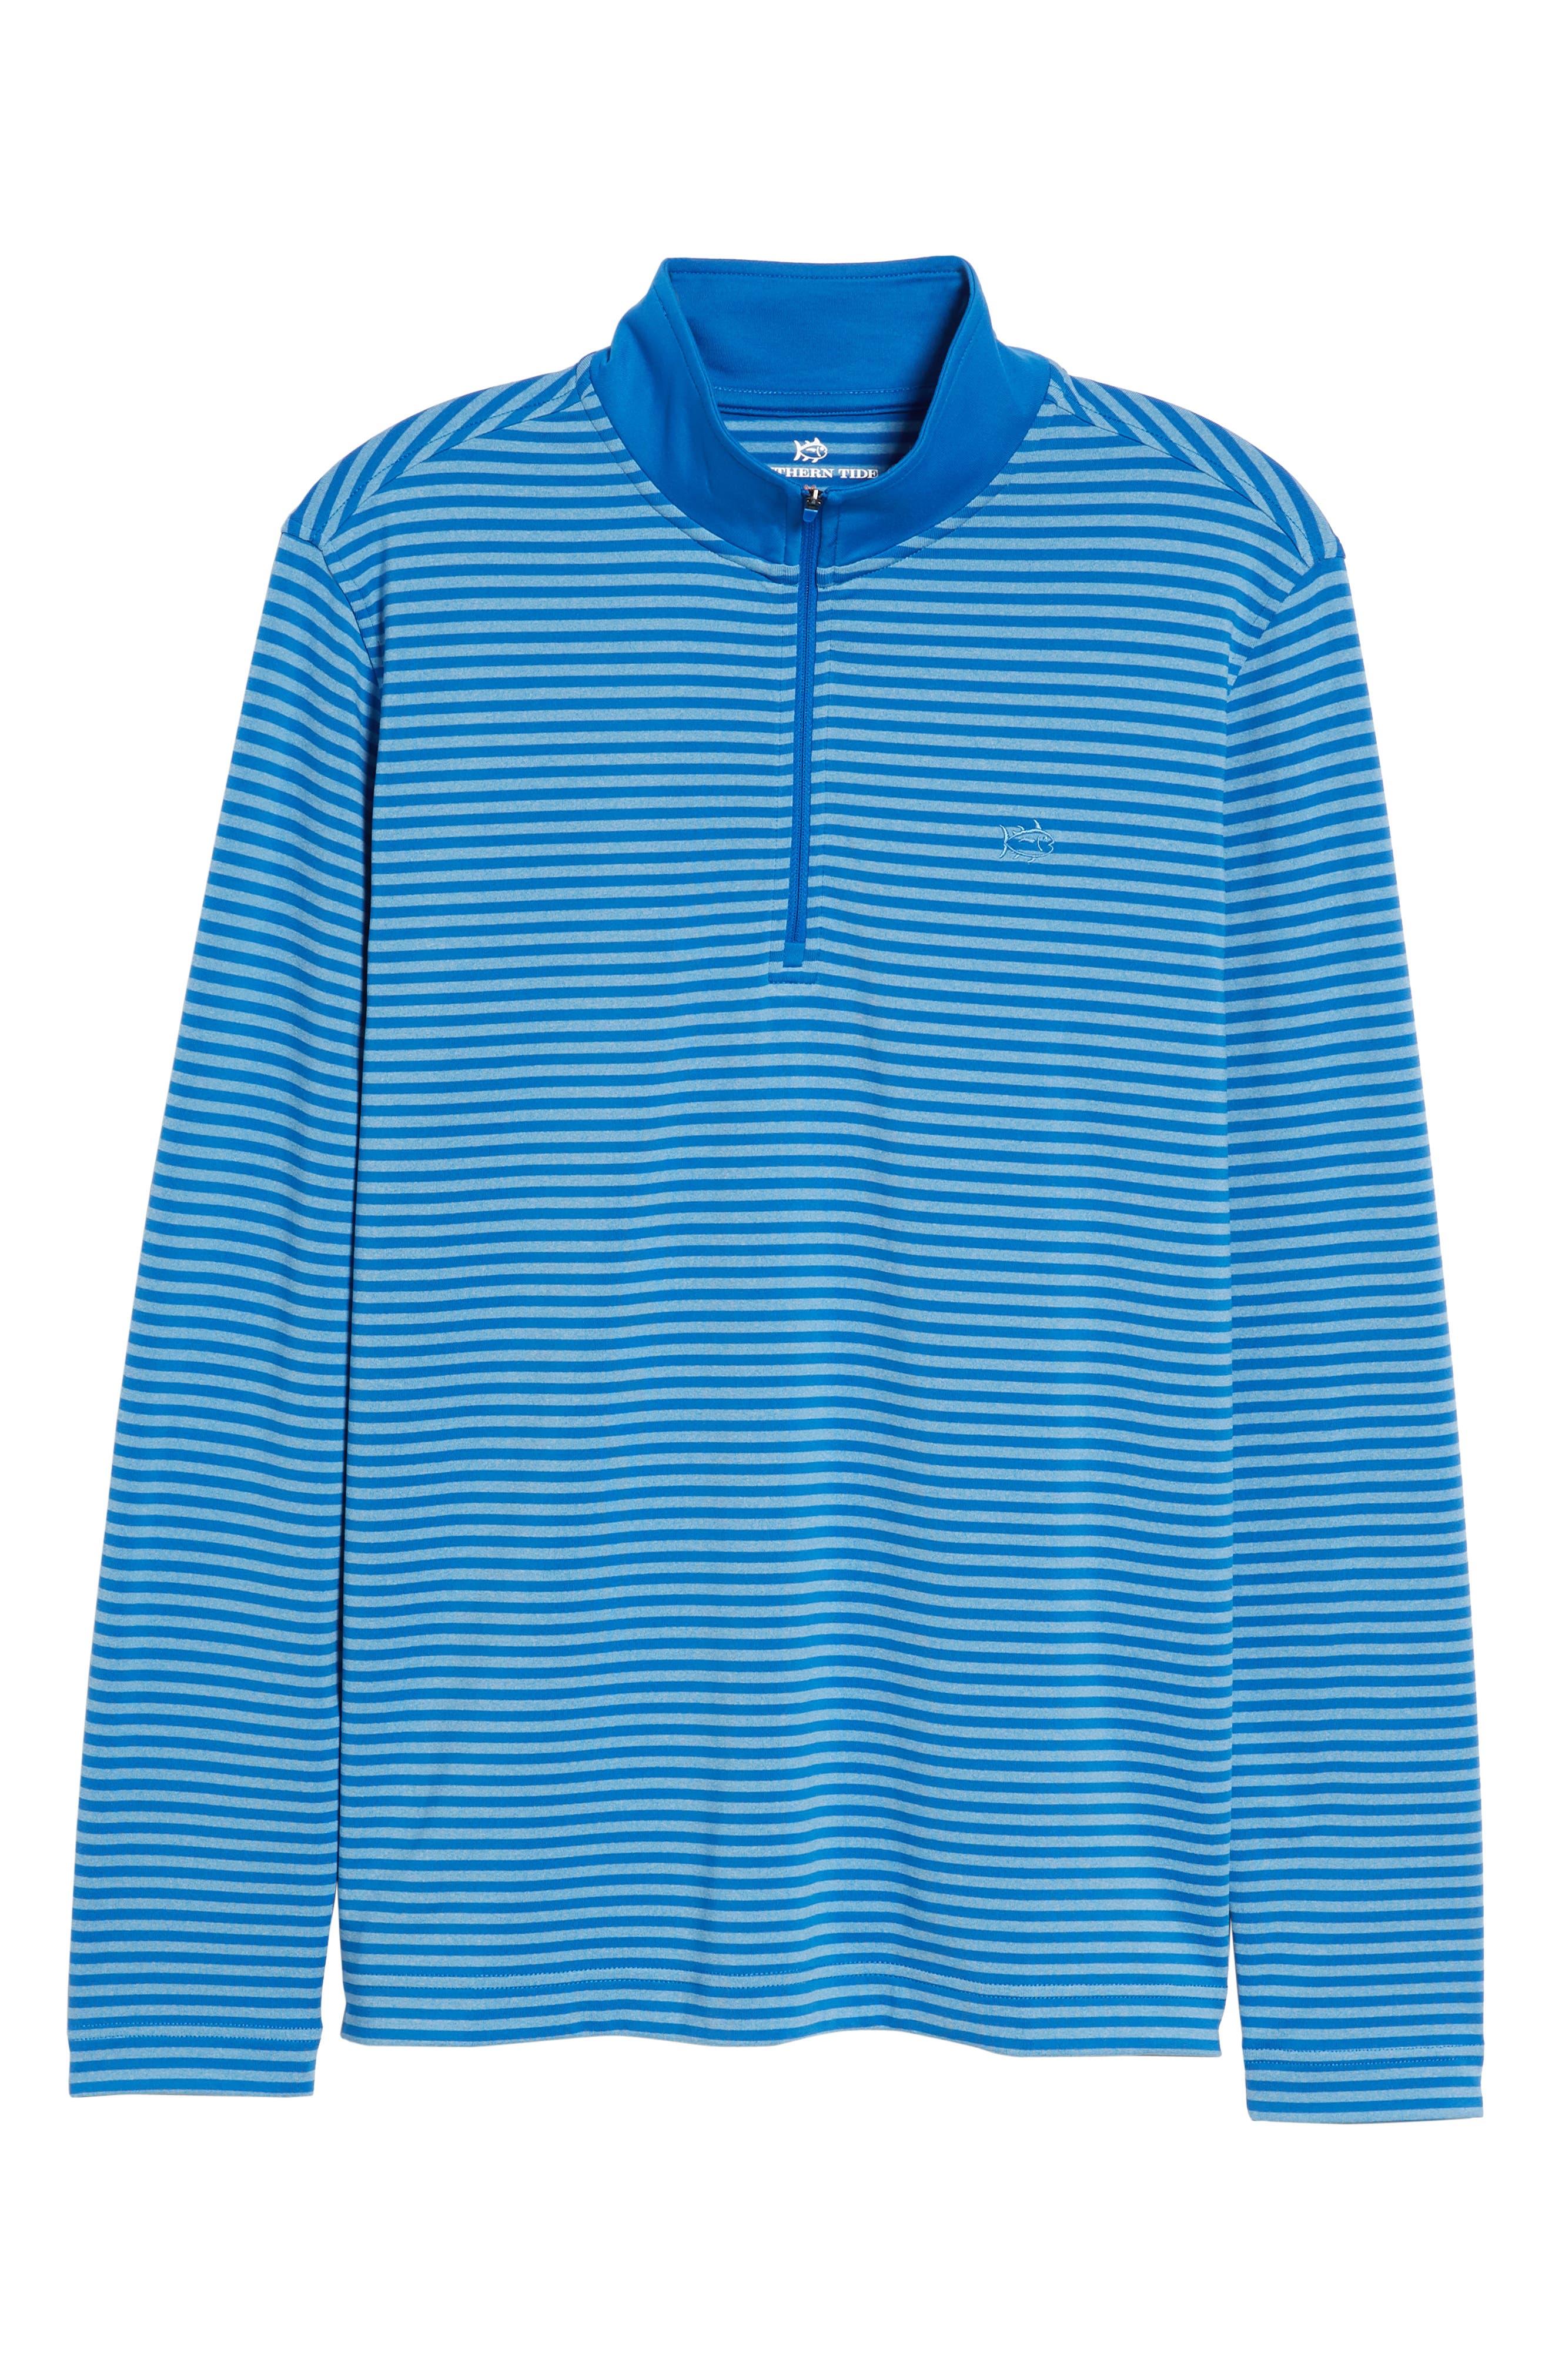 SOUTHERN TIDE,                             Stripe Quarter Zip Pullover,                             Alternate thumbnail 6, color,                             400